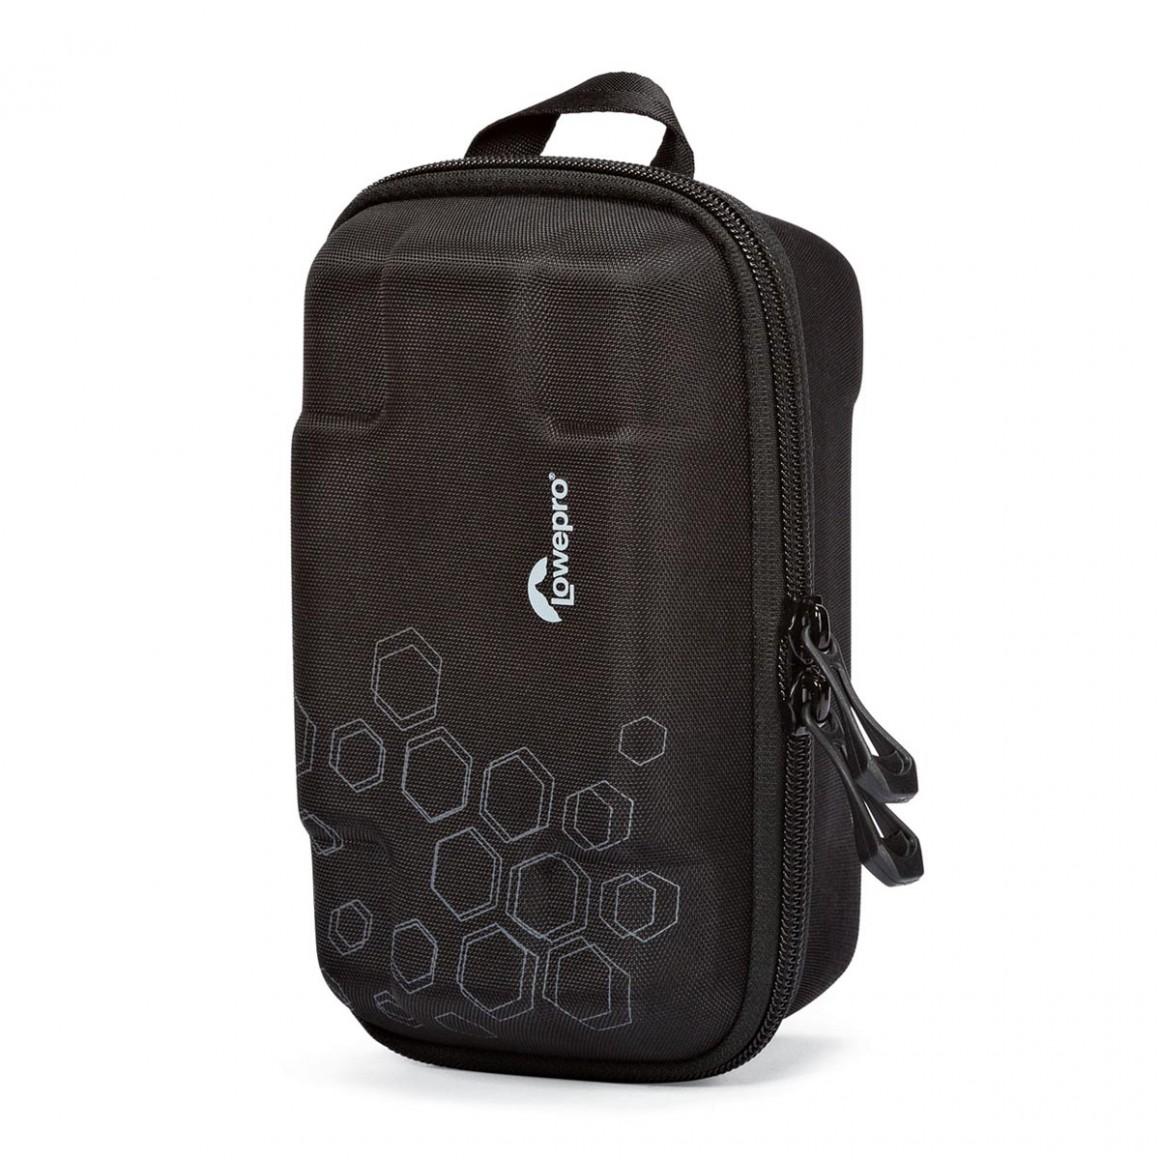 Lowepro Adventura Sh 120 Ii Black Dashpoint Avc 1 Hard Case